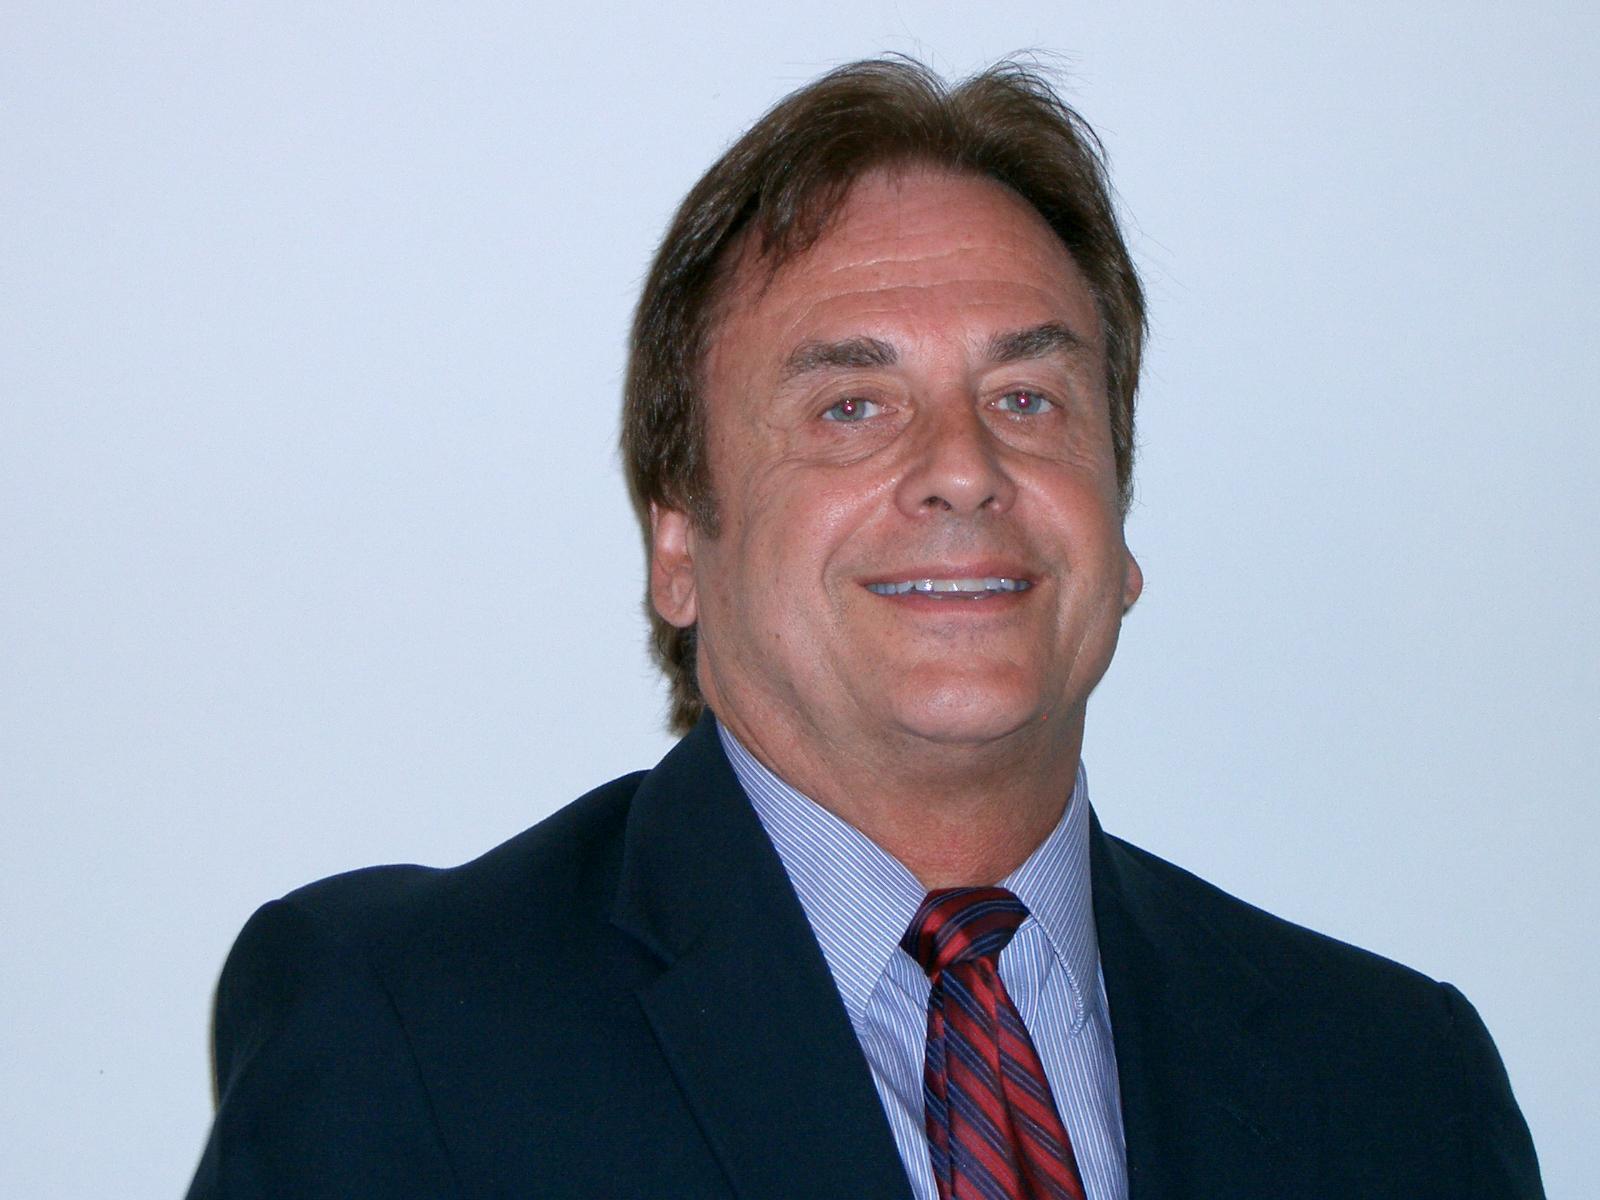 Steven Stasczak